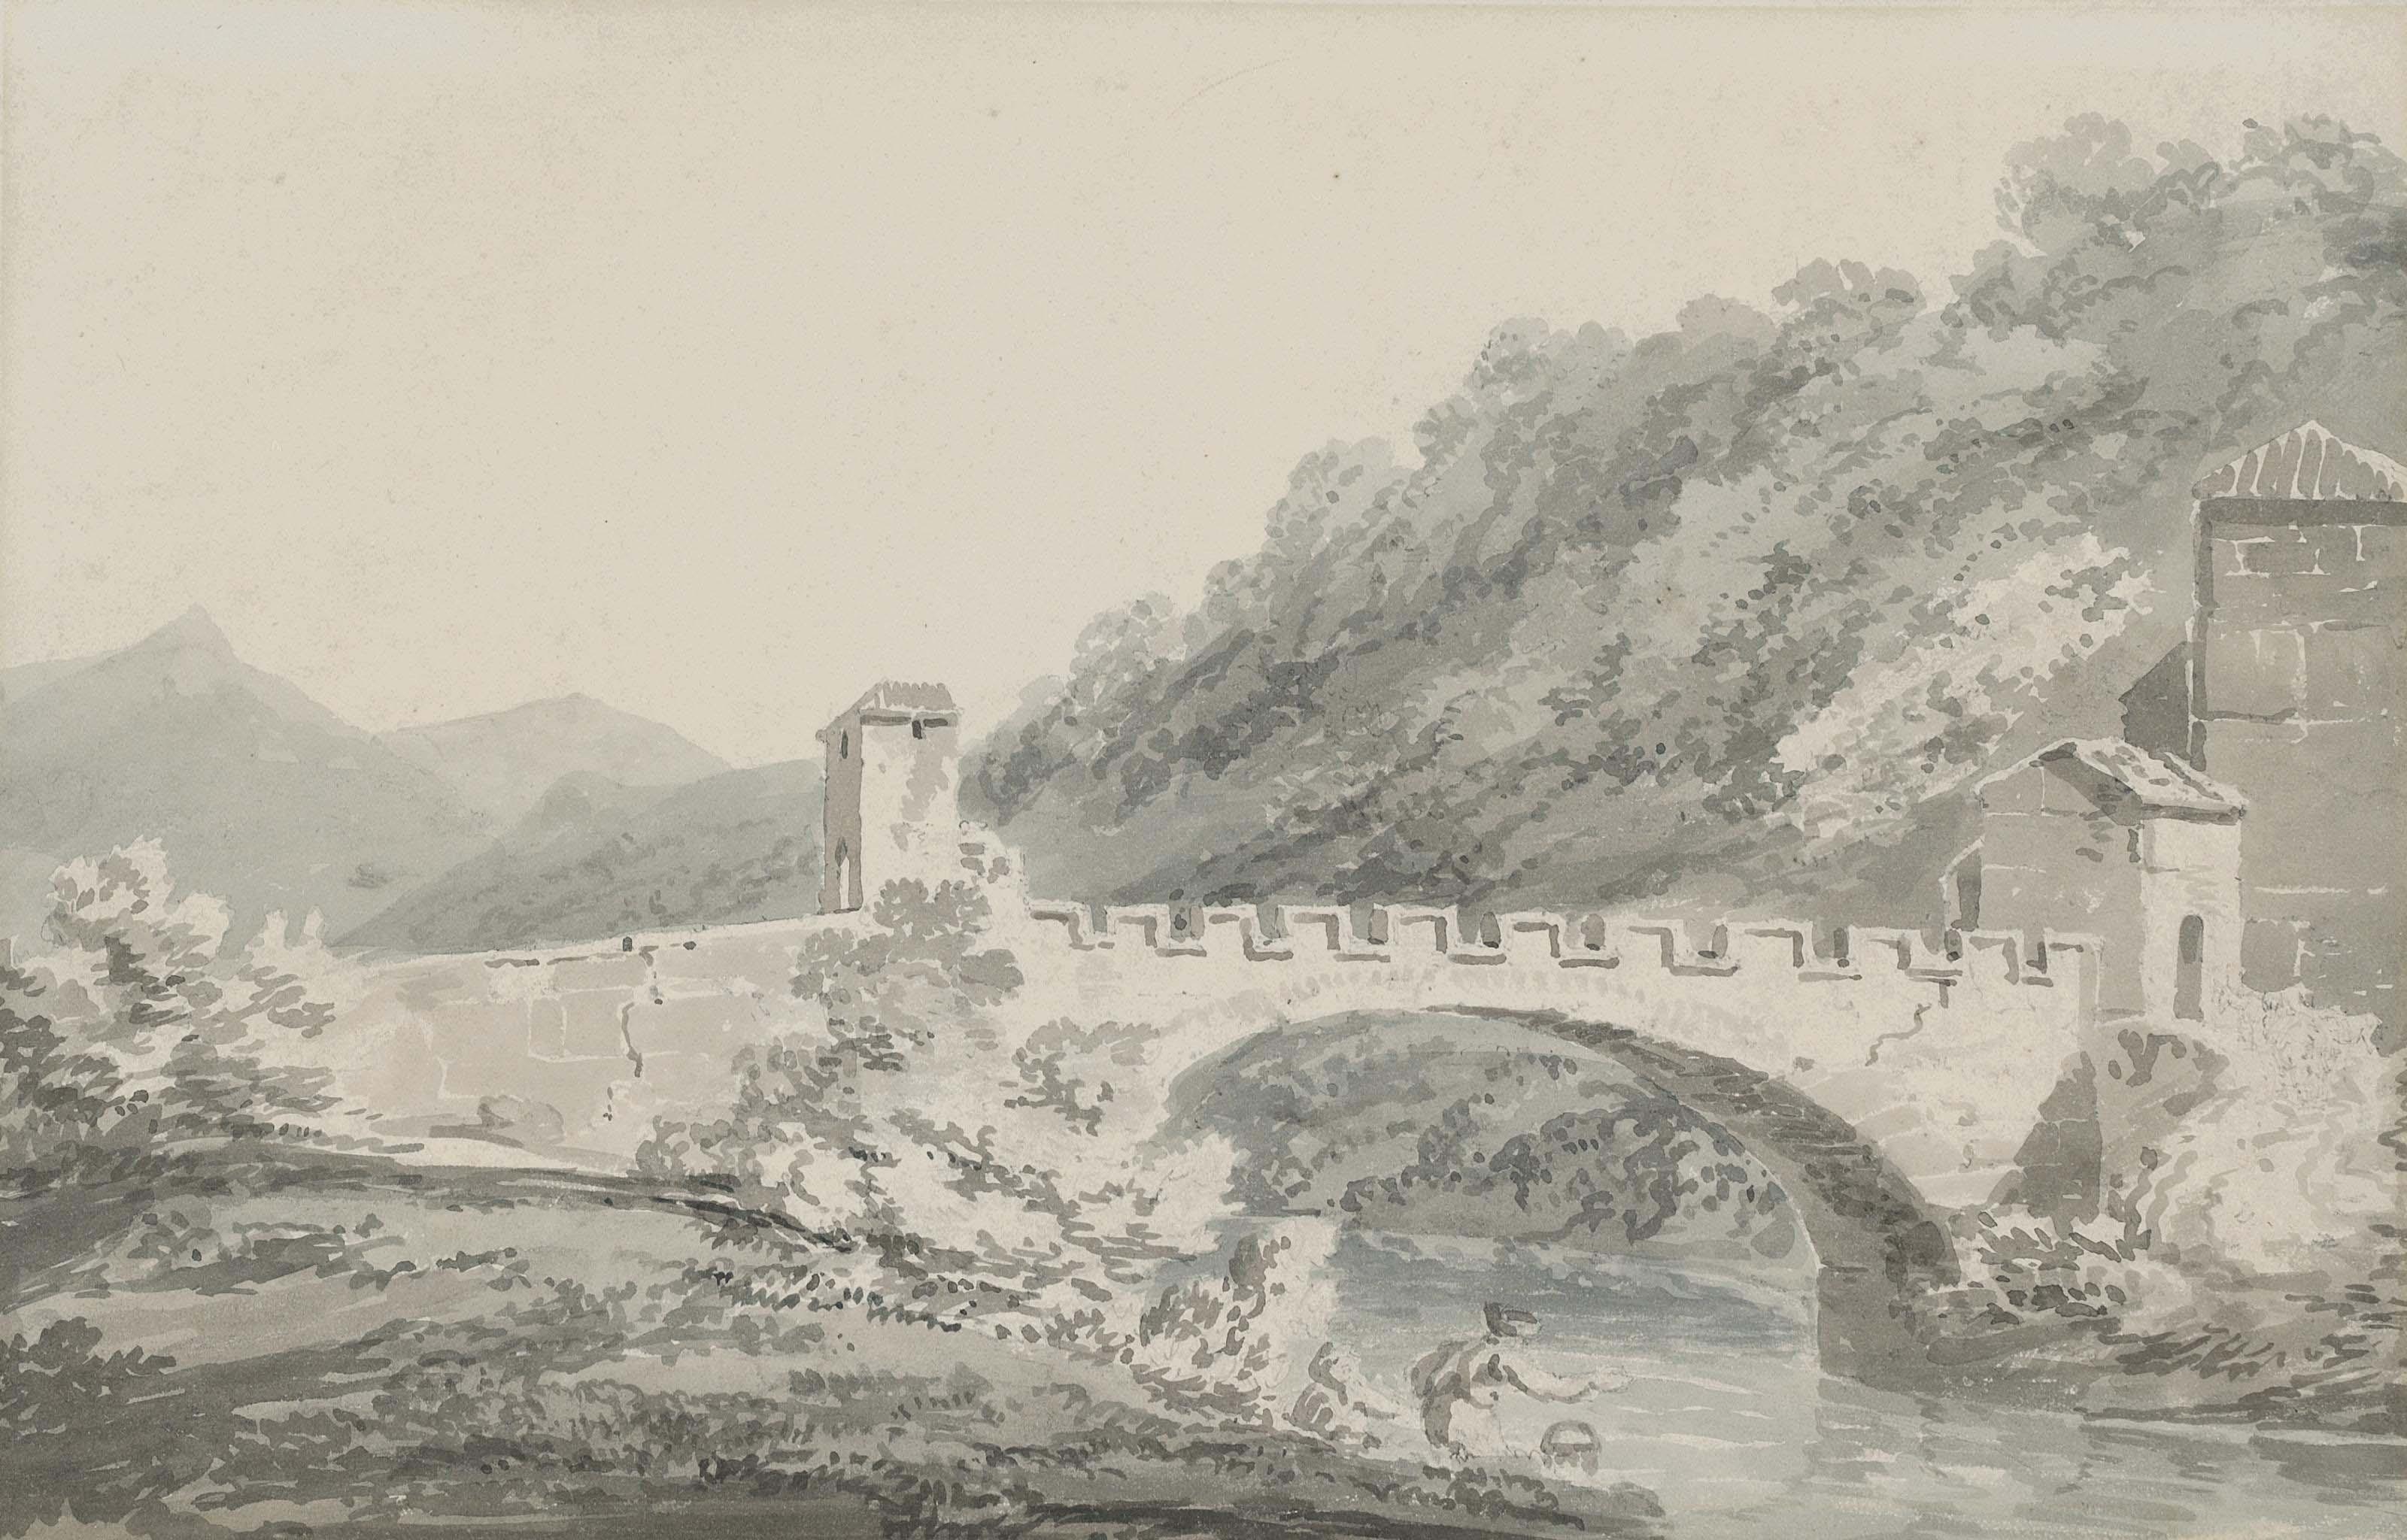 Figures before a bridge